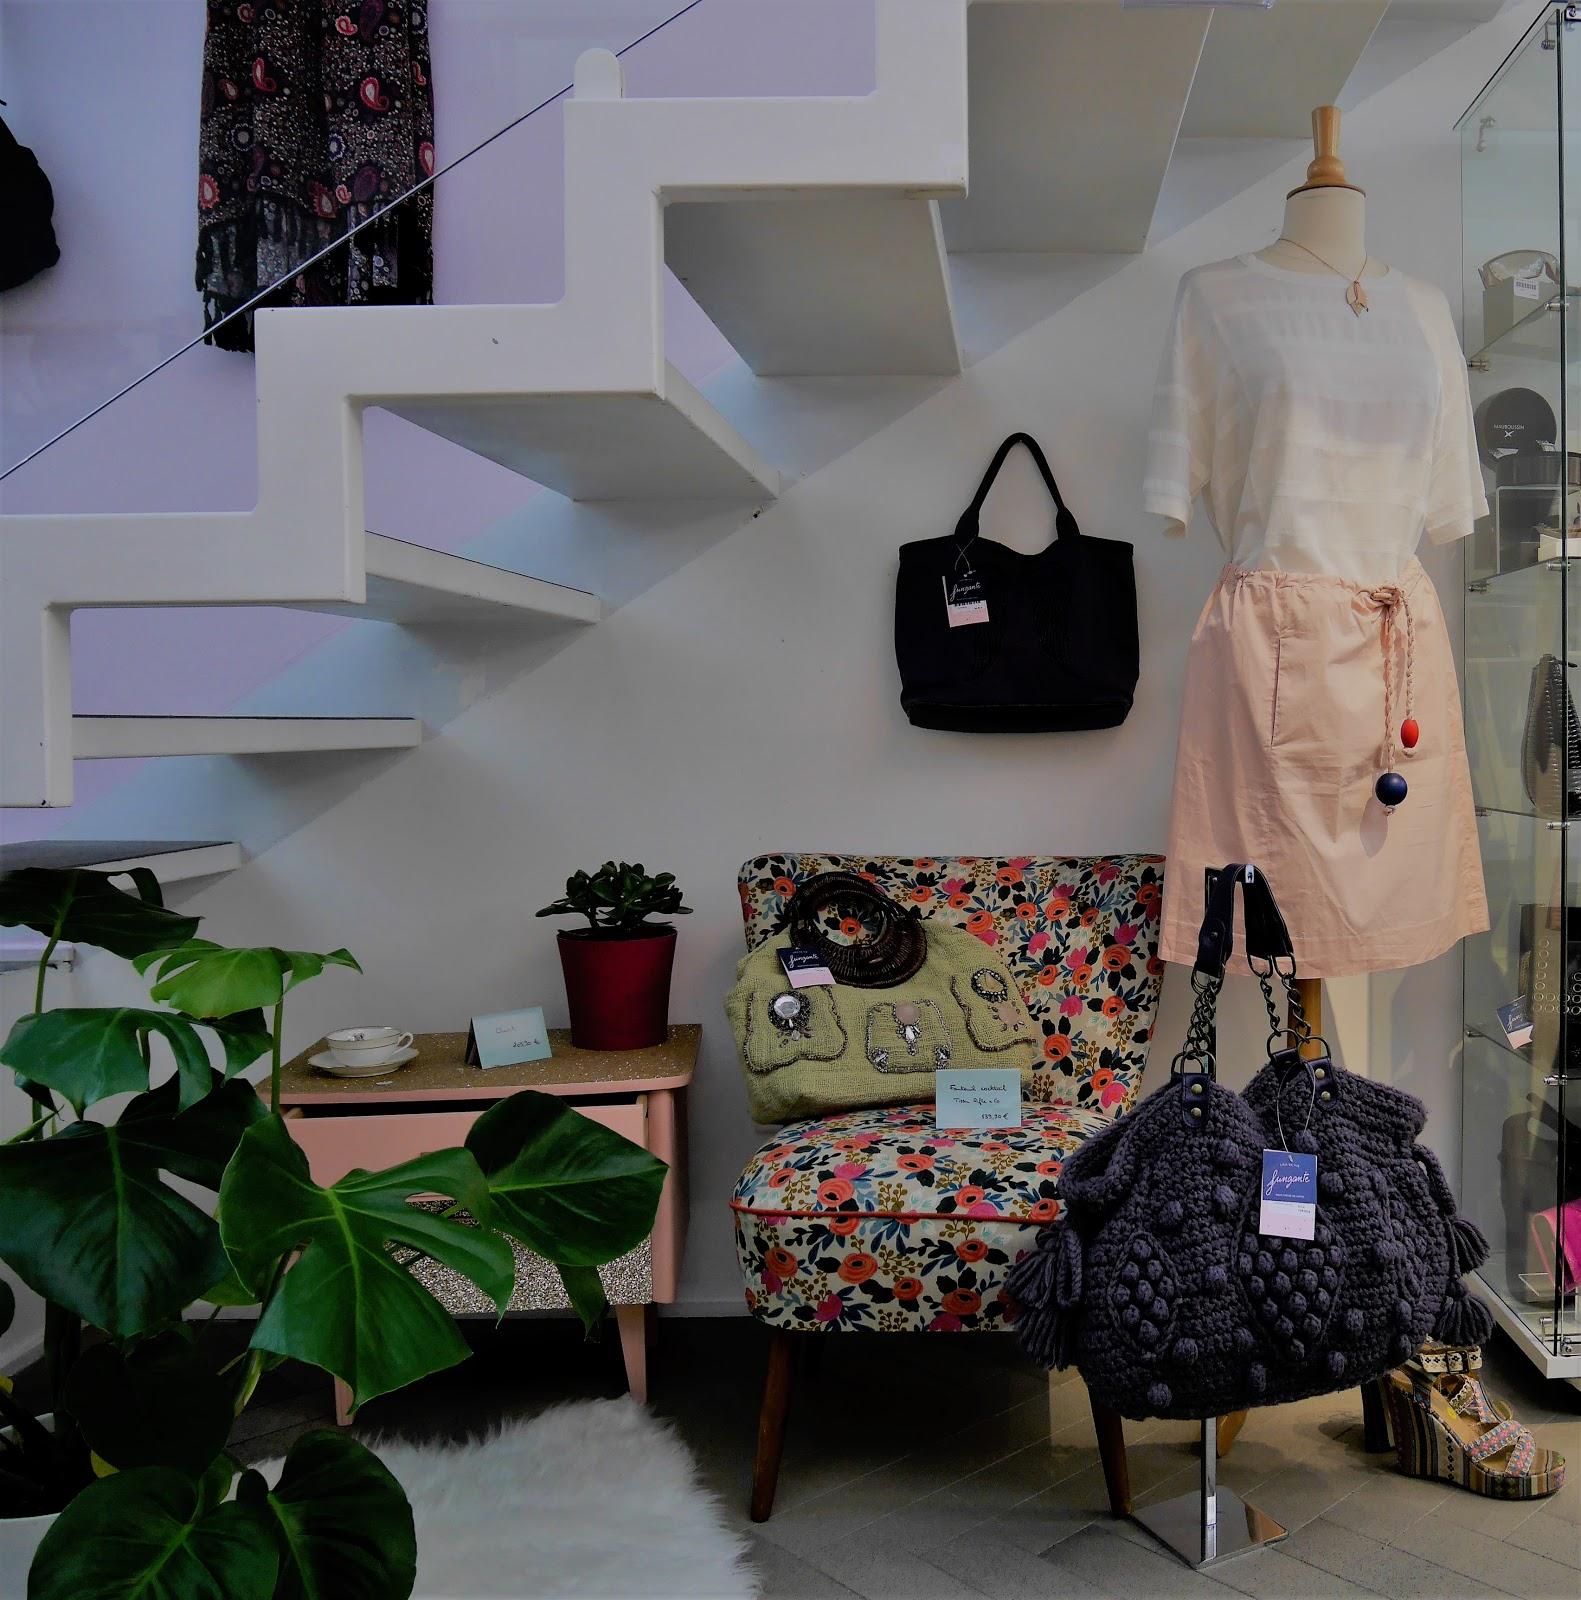 fringante-boutique-depot-vente-et-createurs-nogent-sur-marne-danslaruedacote.fr-7